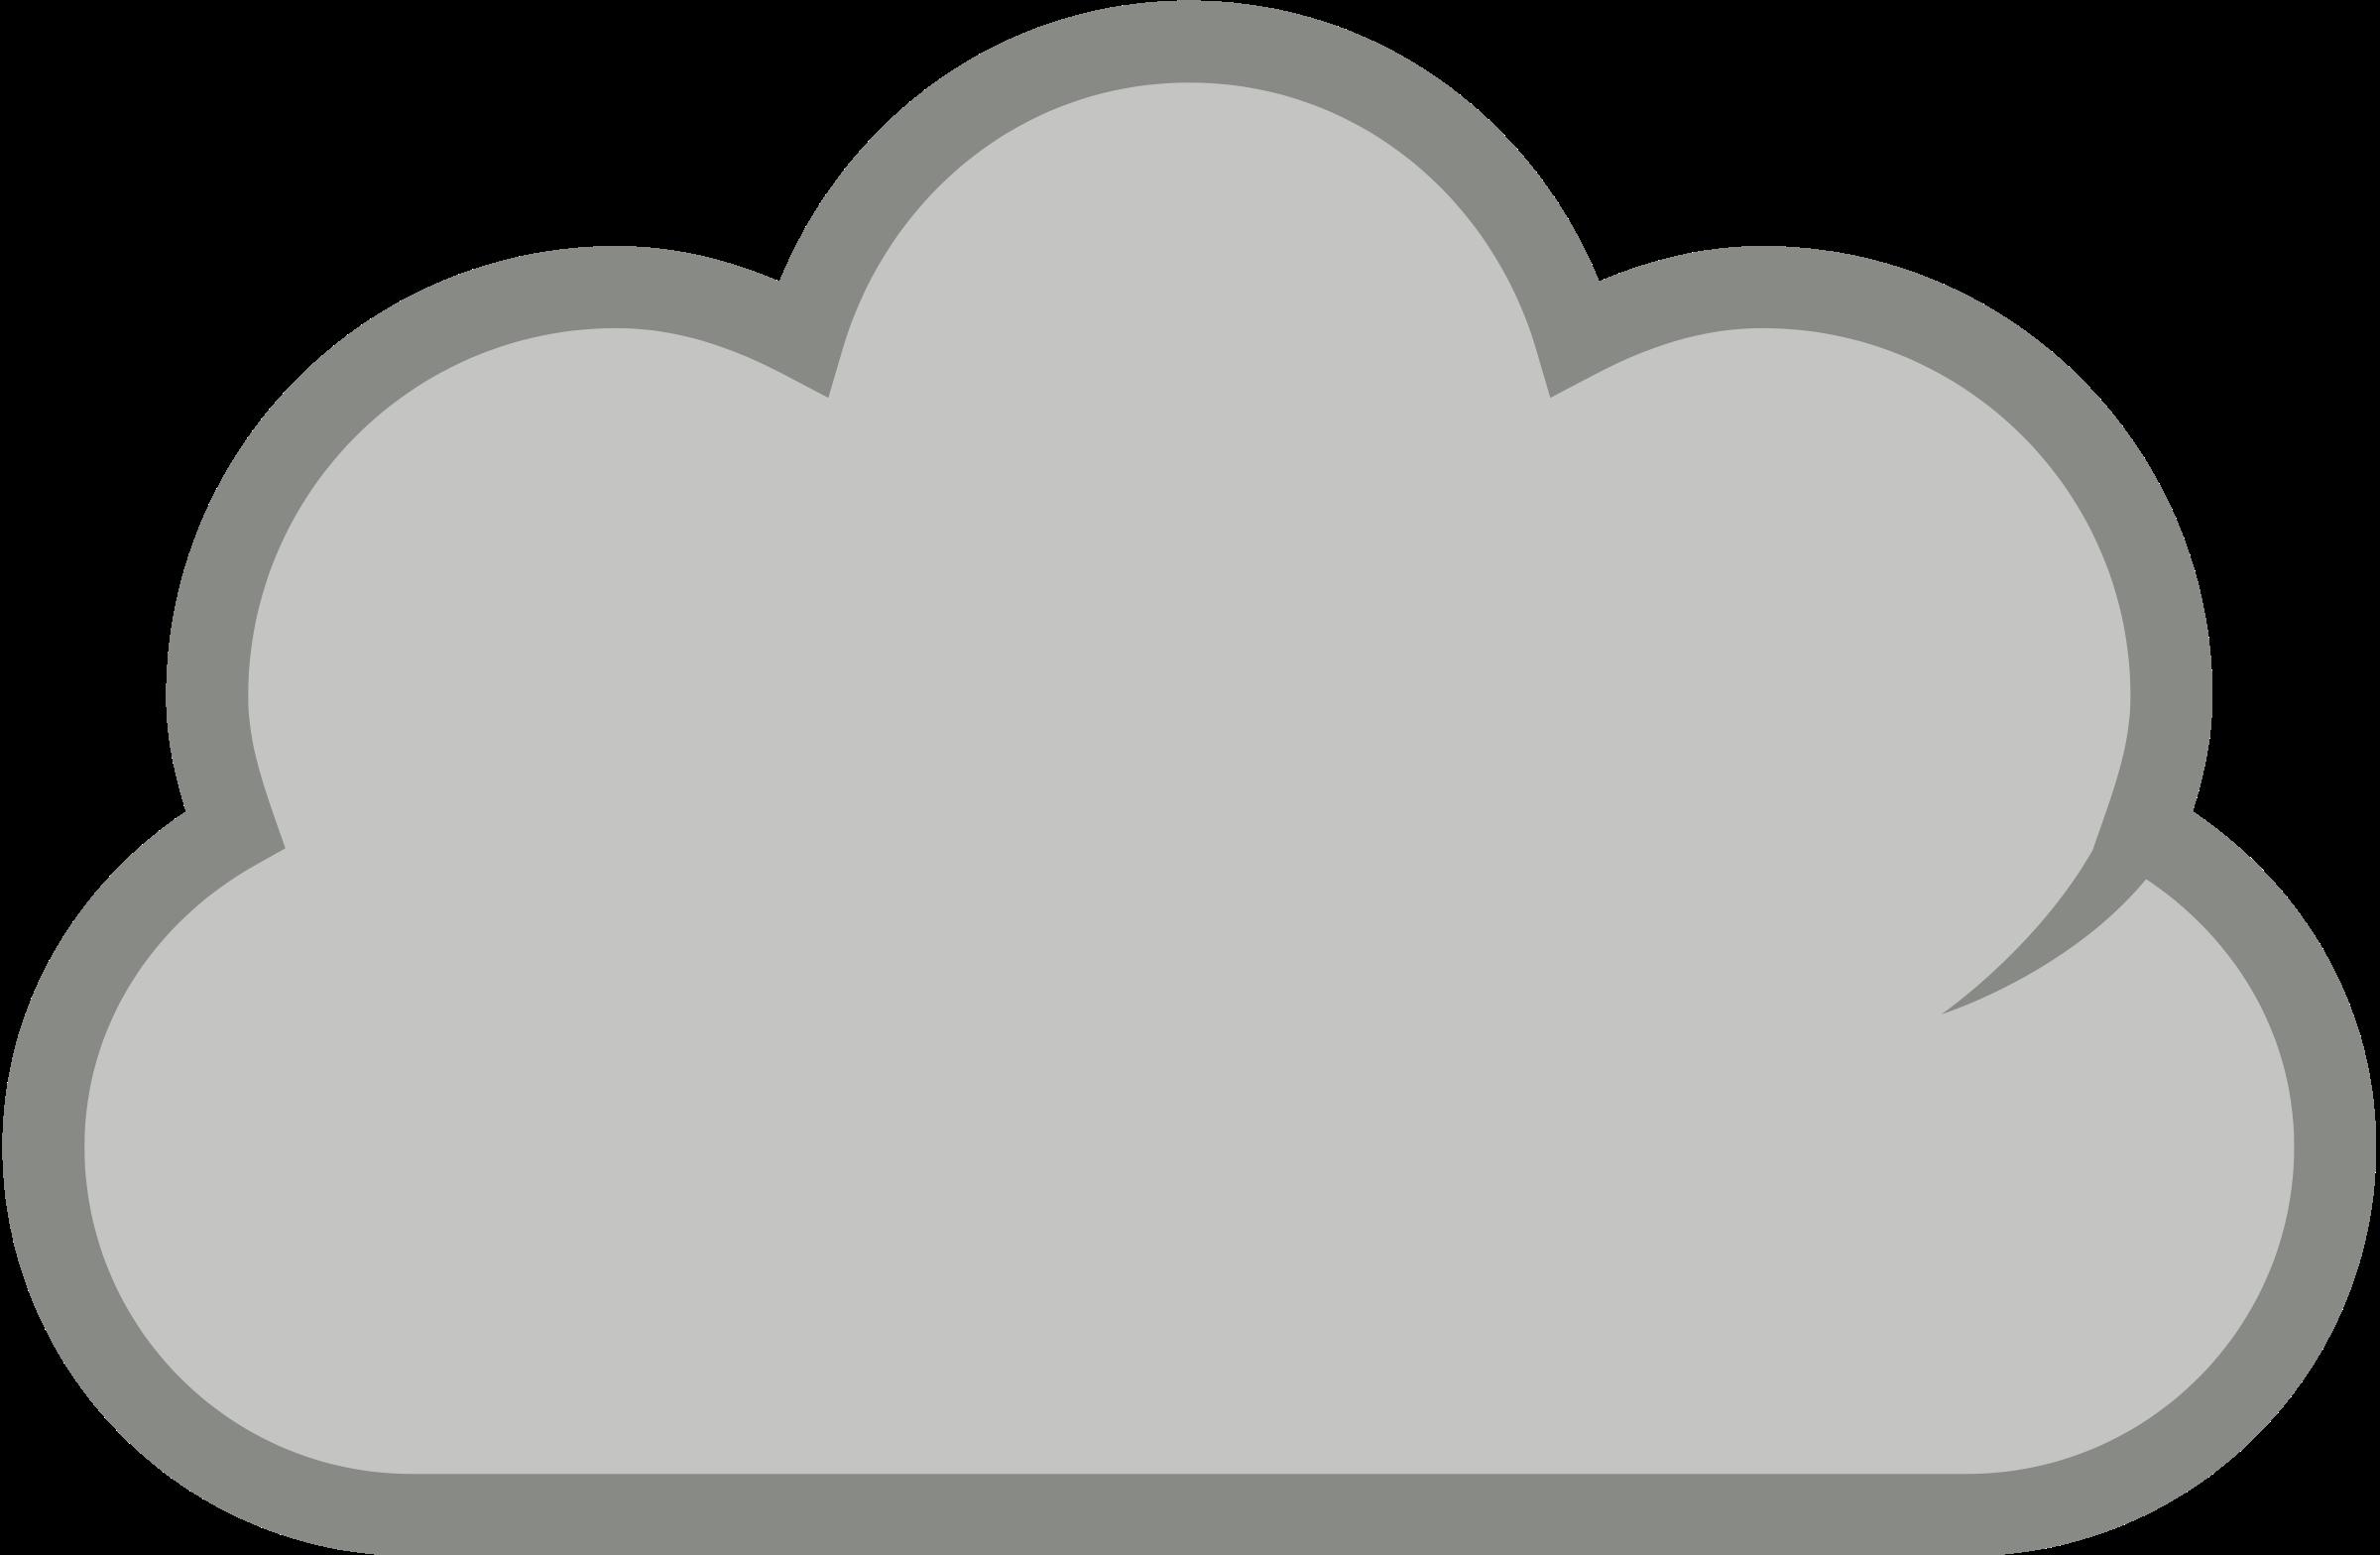 Lightening clipart grey cloud Panda Clipart Pictures Art Clip